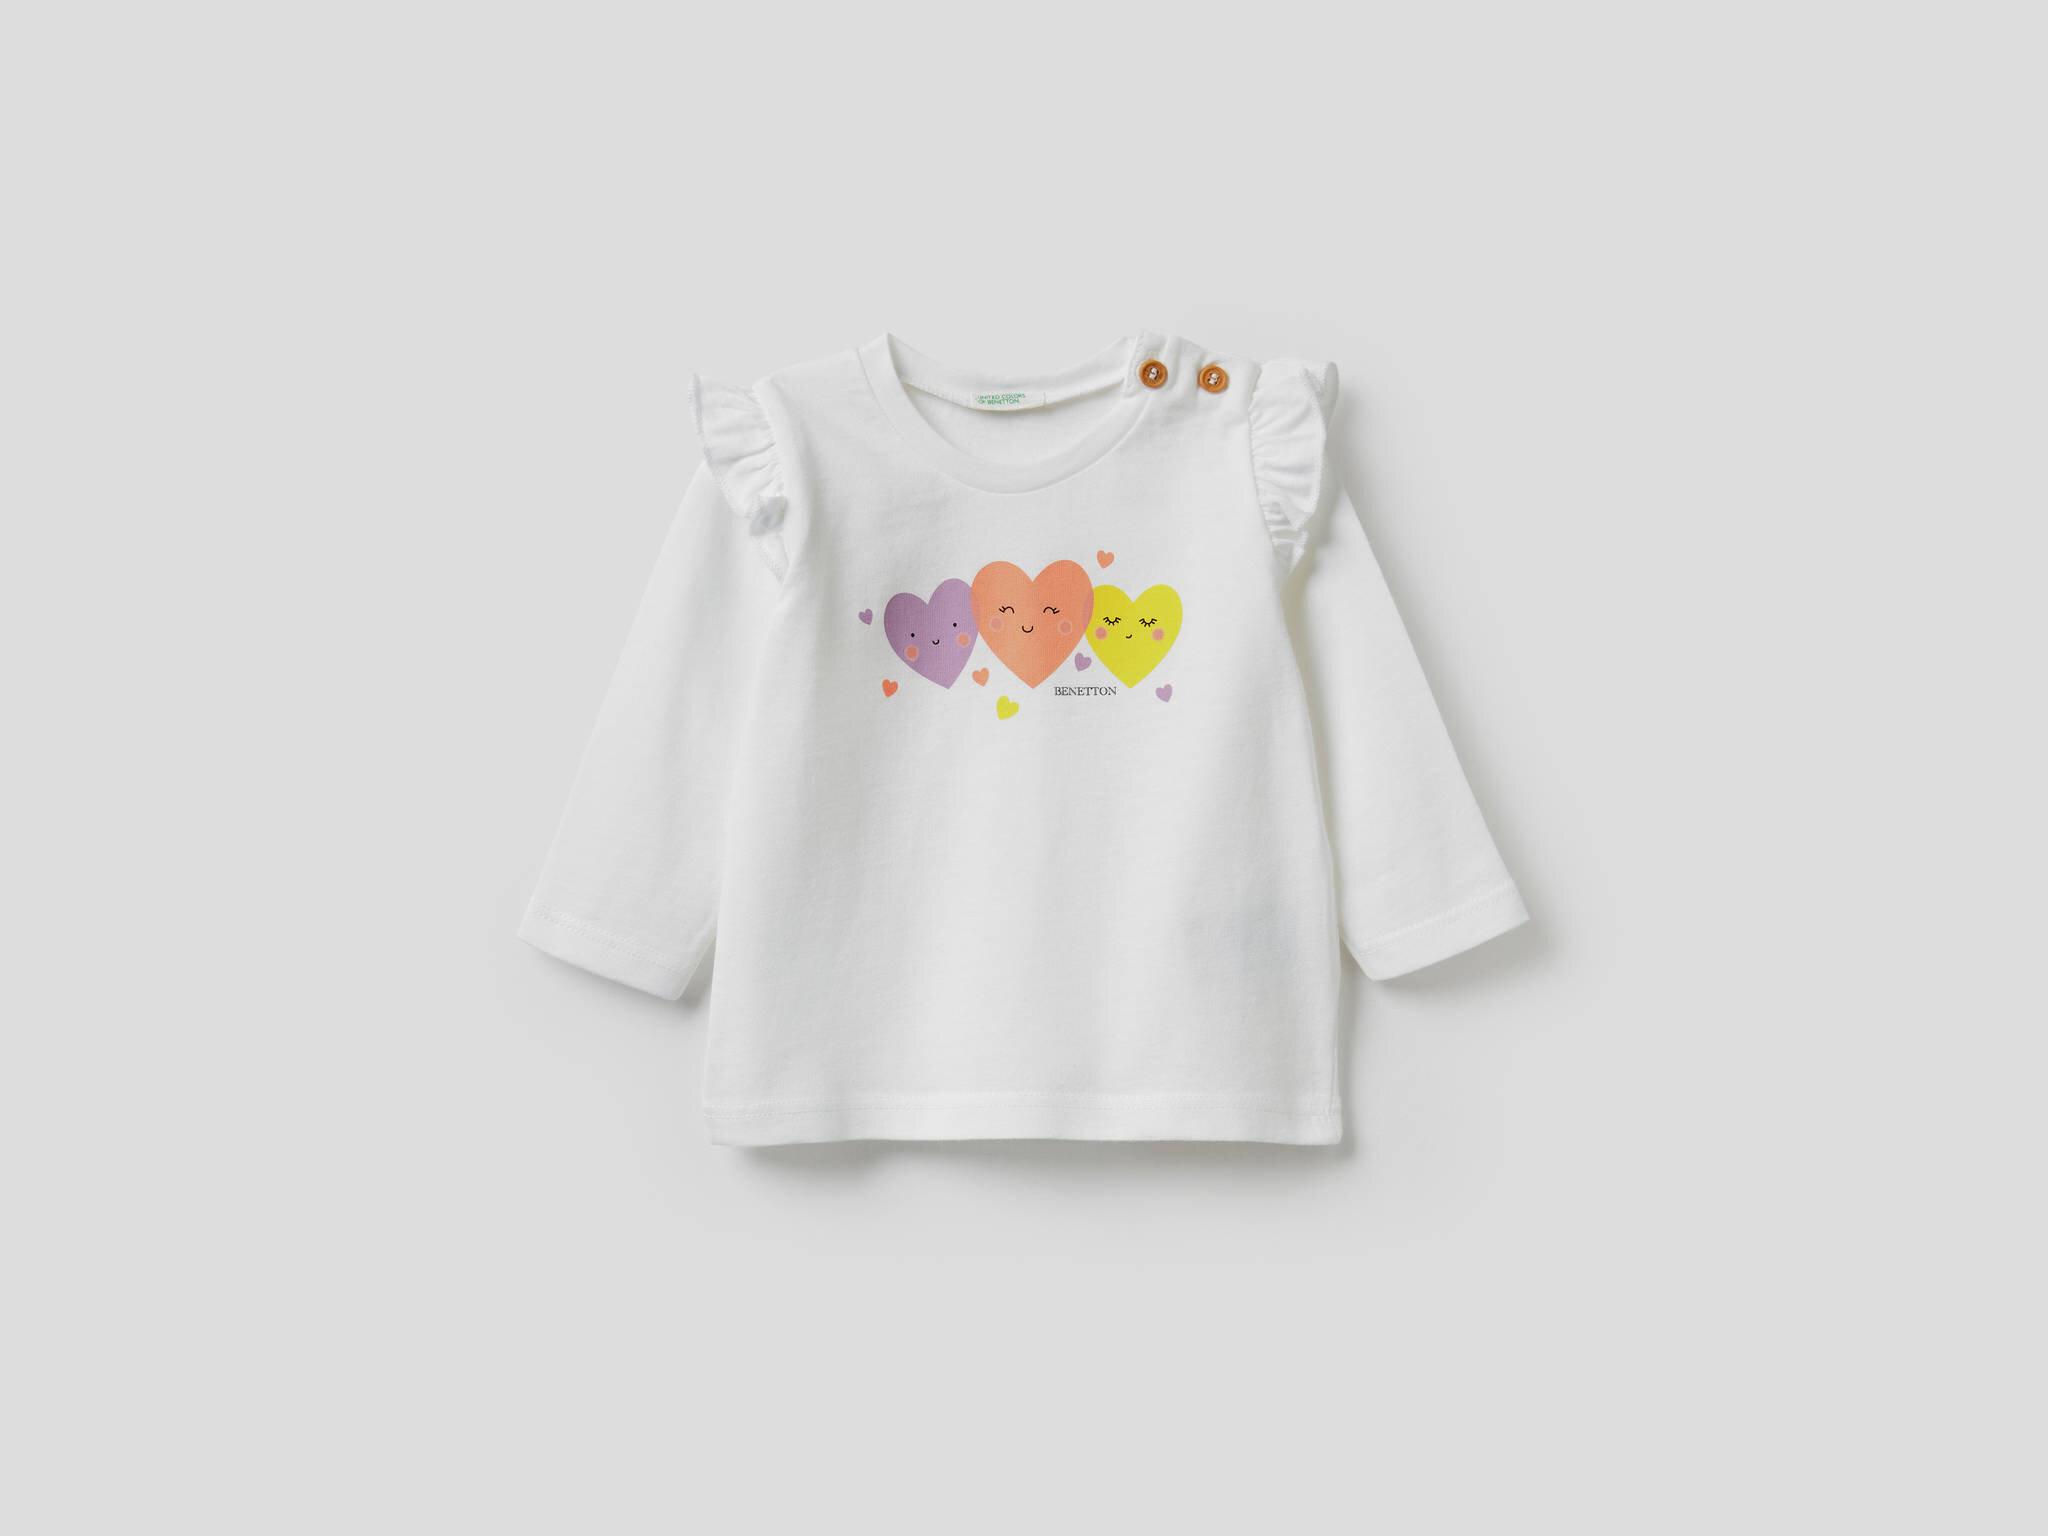 Kalp Baskılı Tshirt